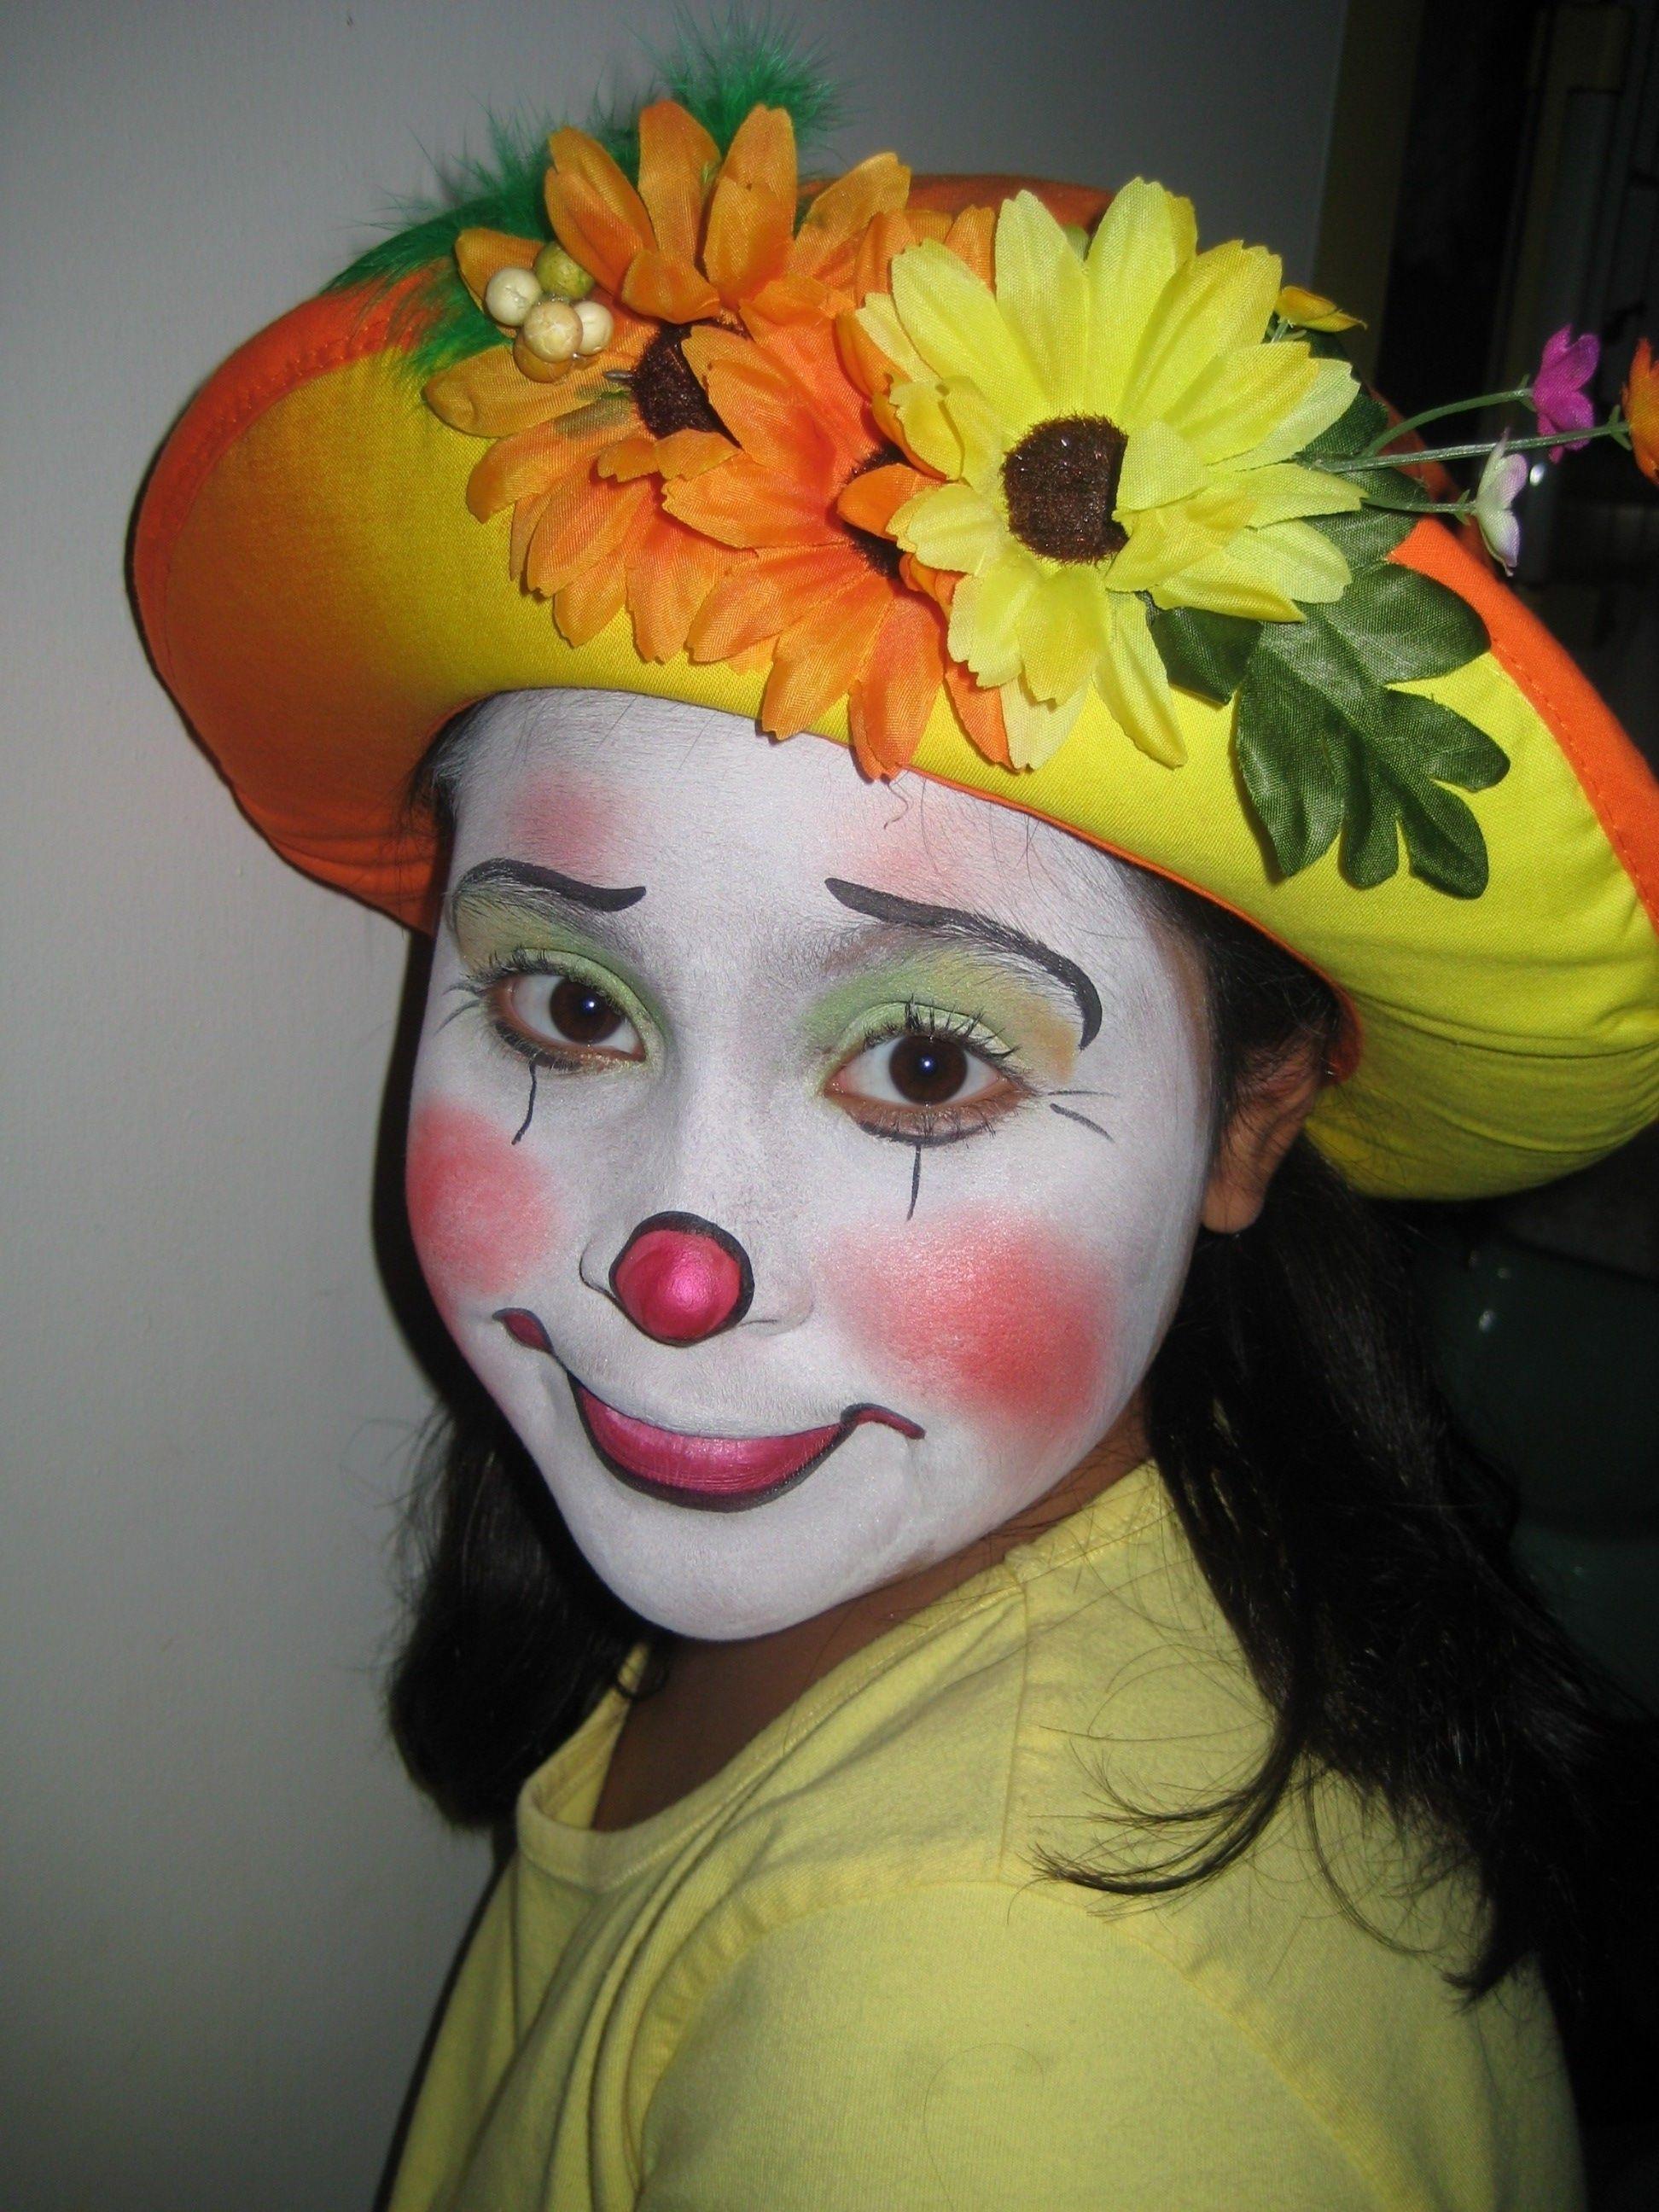 harlekin clownfrau in 2019 cupcakes jester costume circus. Black Bedroom Furniture Sets. Home Design Ideas